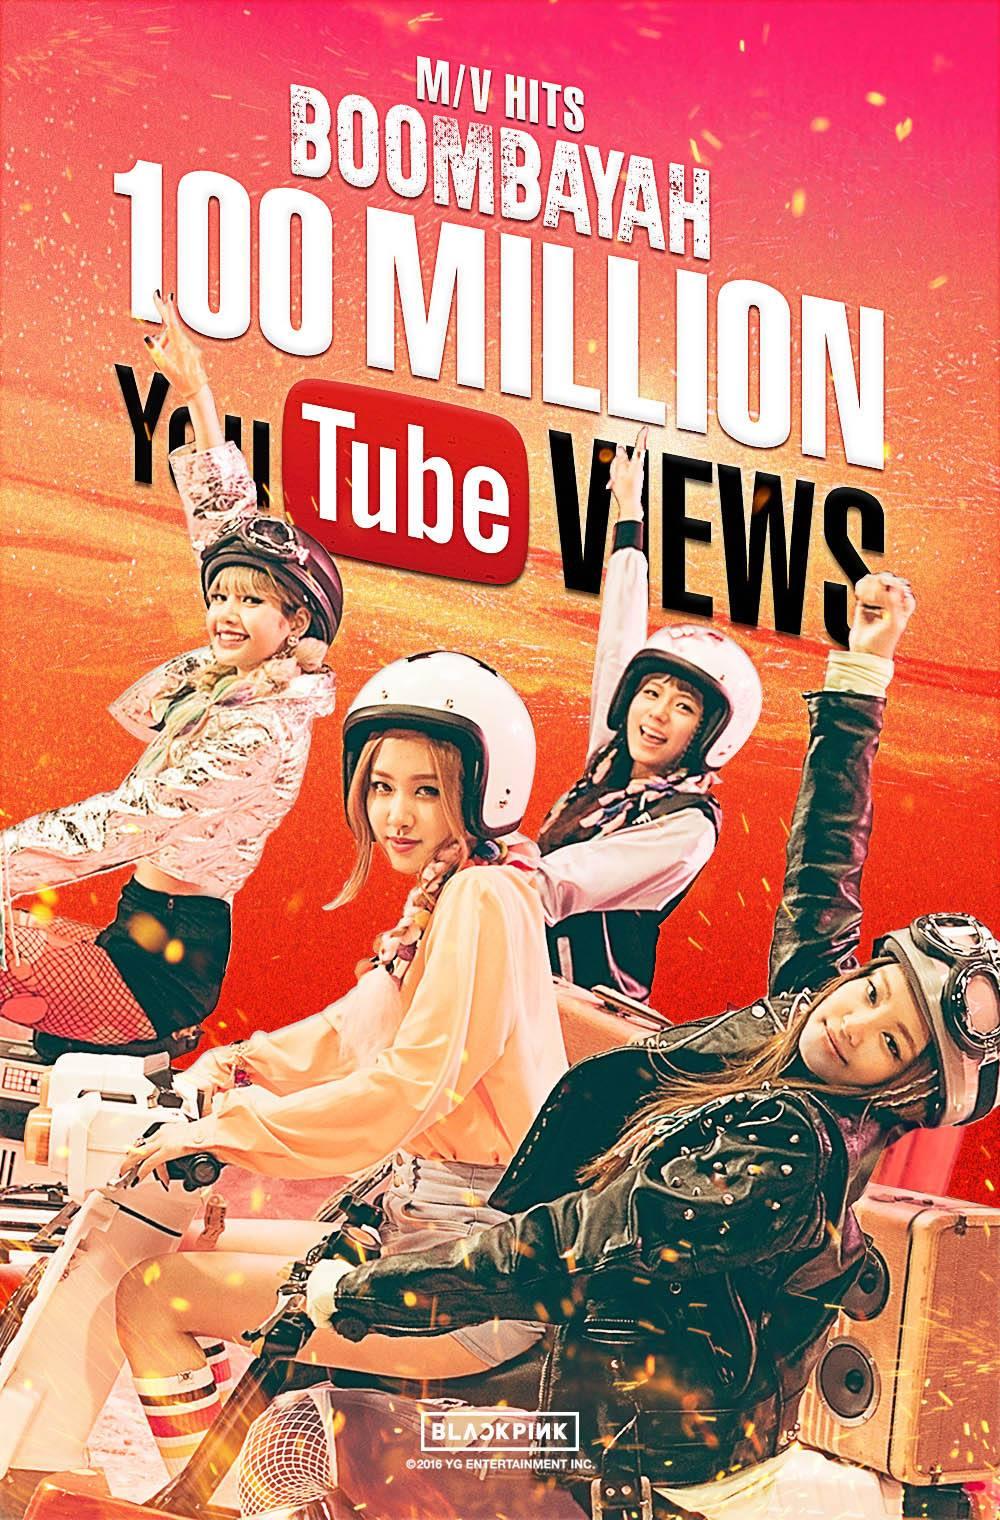 「BLACKPINK」8月30日、日本デビュー決定!K-POPガールズグループの中でも完成度が高すぎる